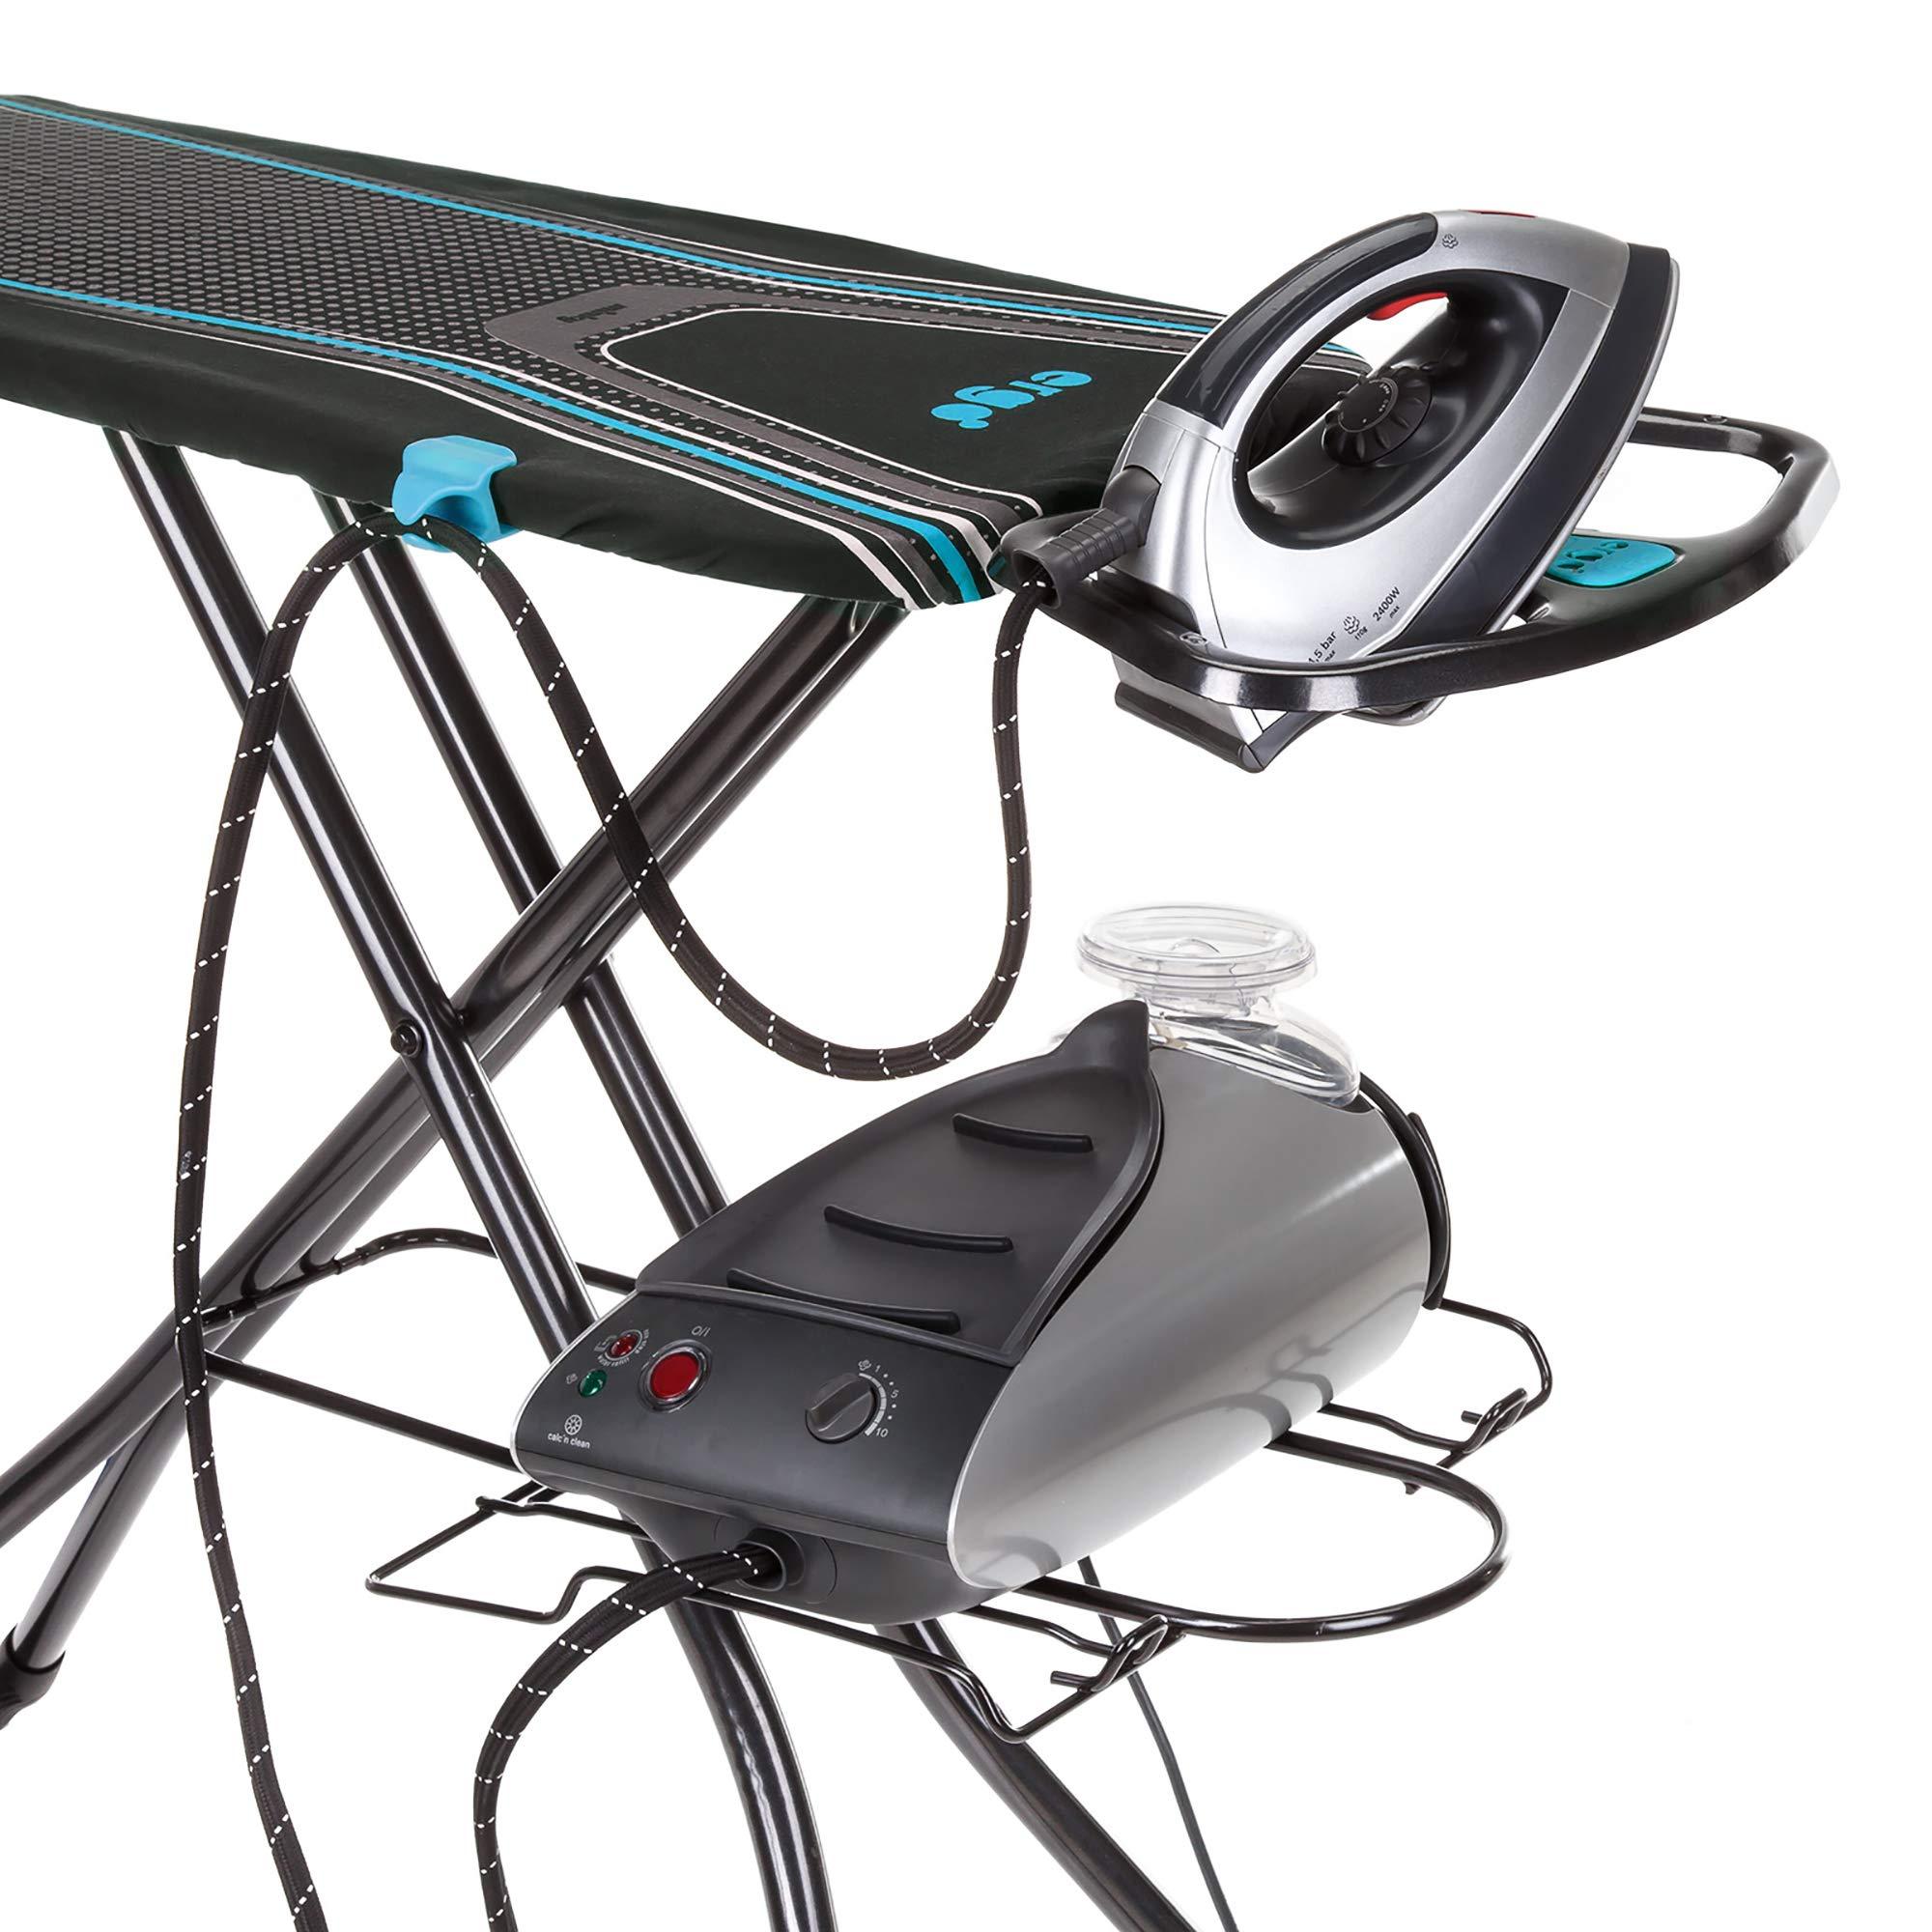 "Minky Homecare Ergo Plus Ironing Board, 48"" x 15"", Black Multi"